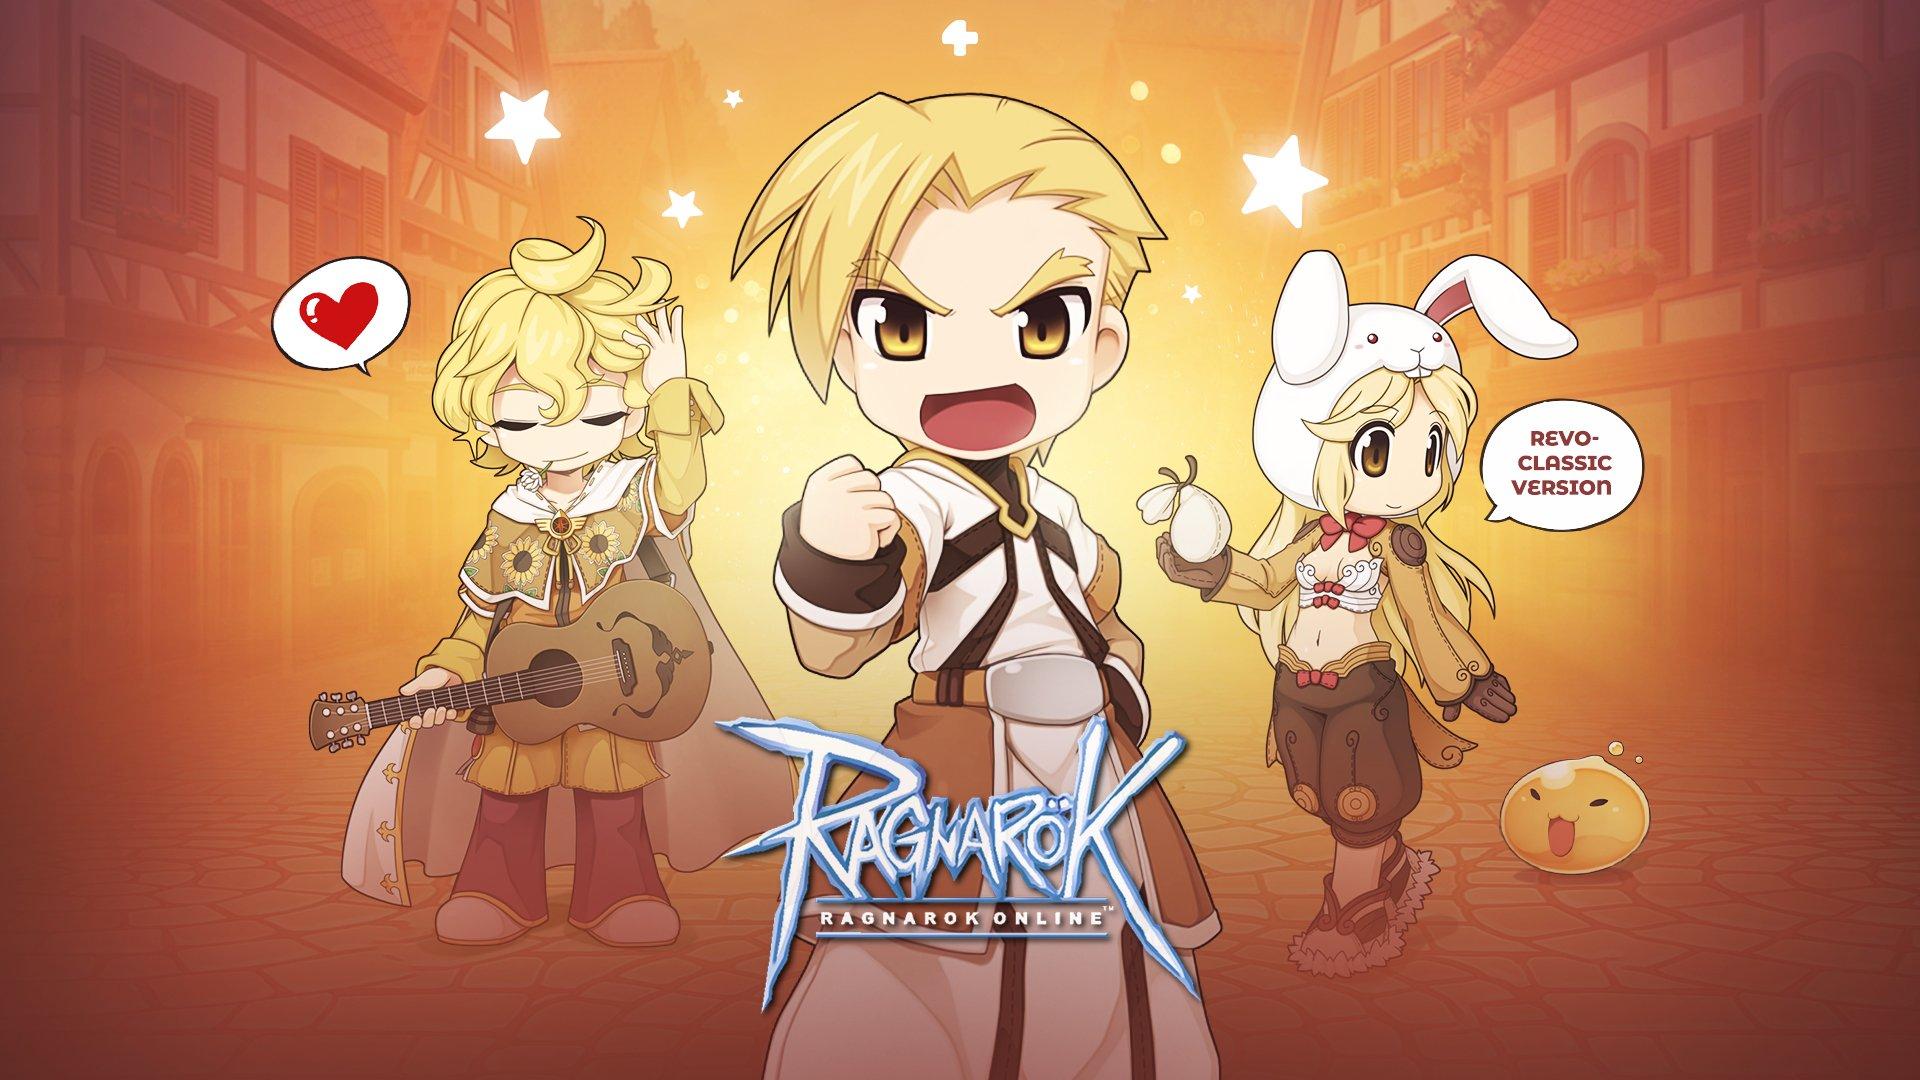 Ragnarok Revo Classic